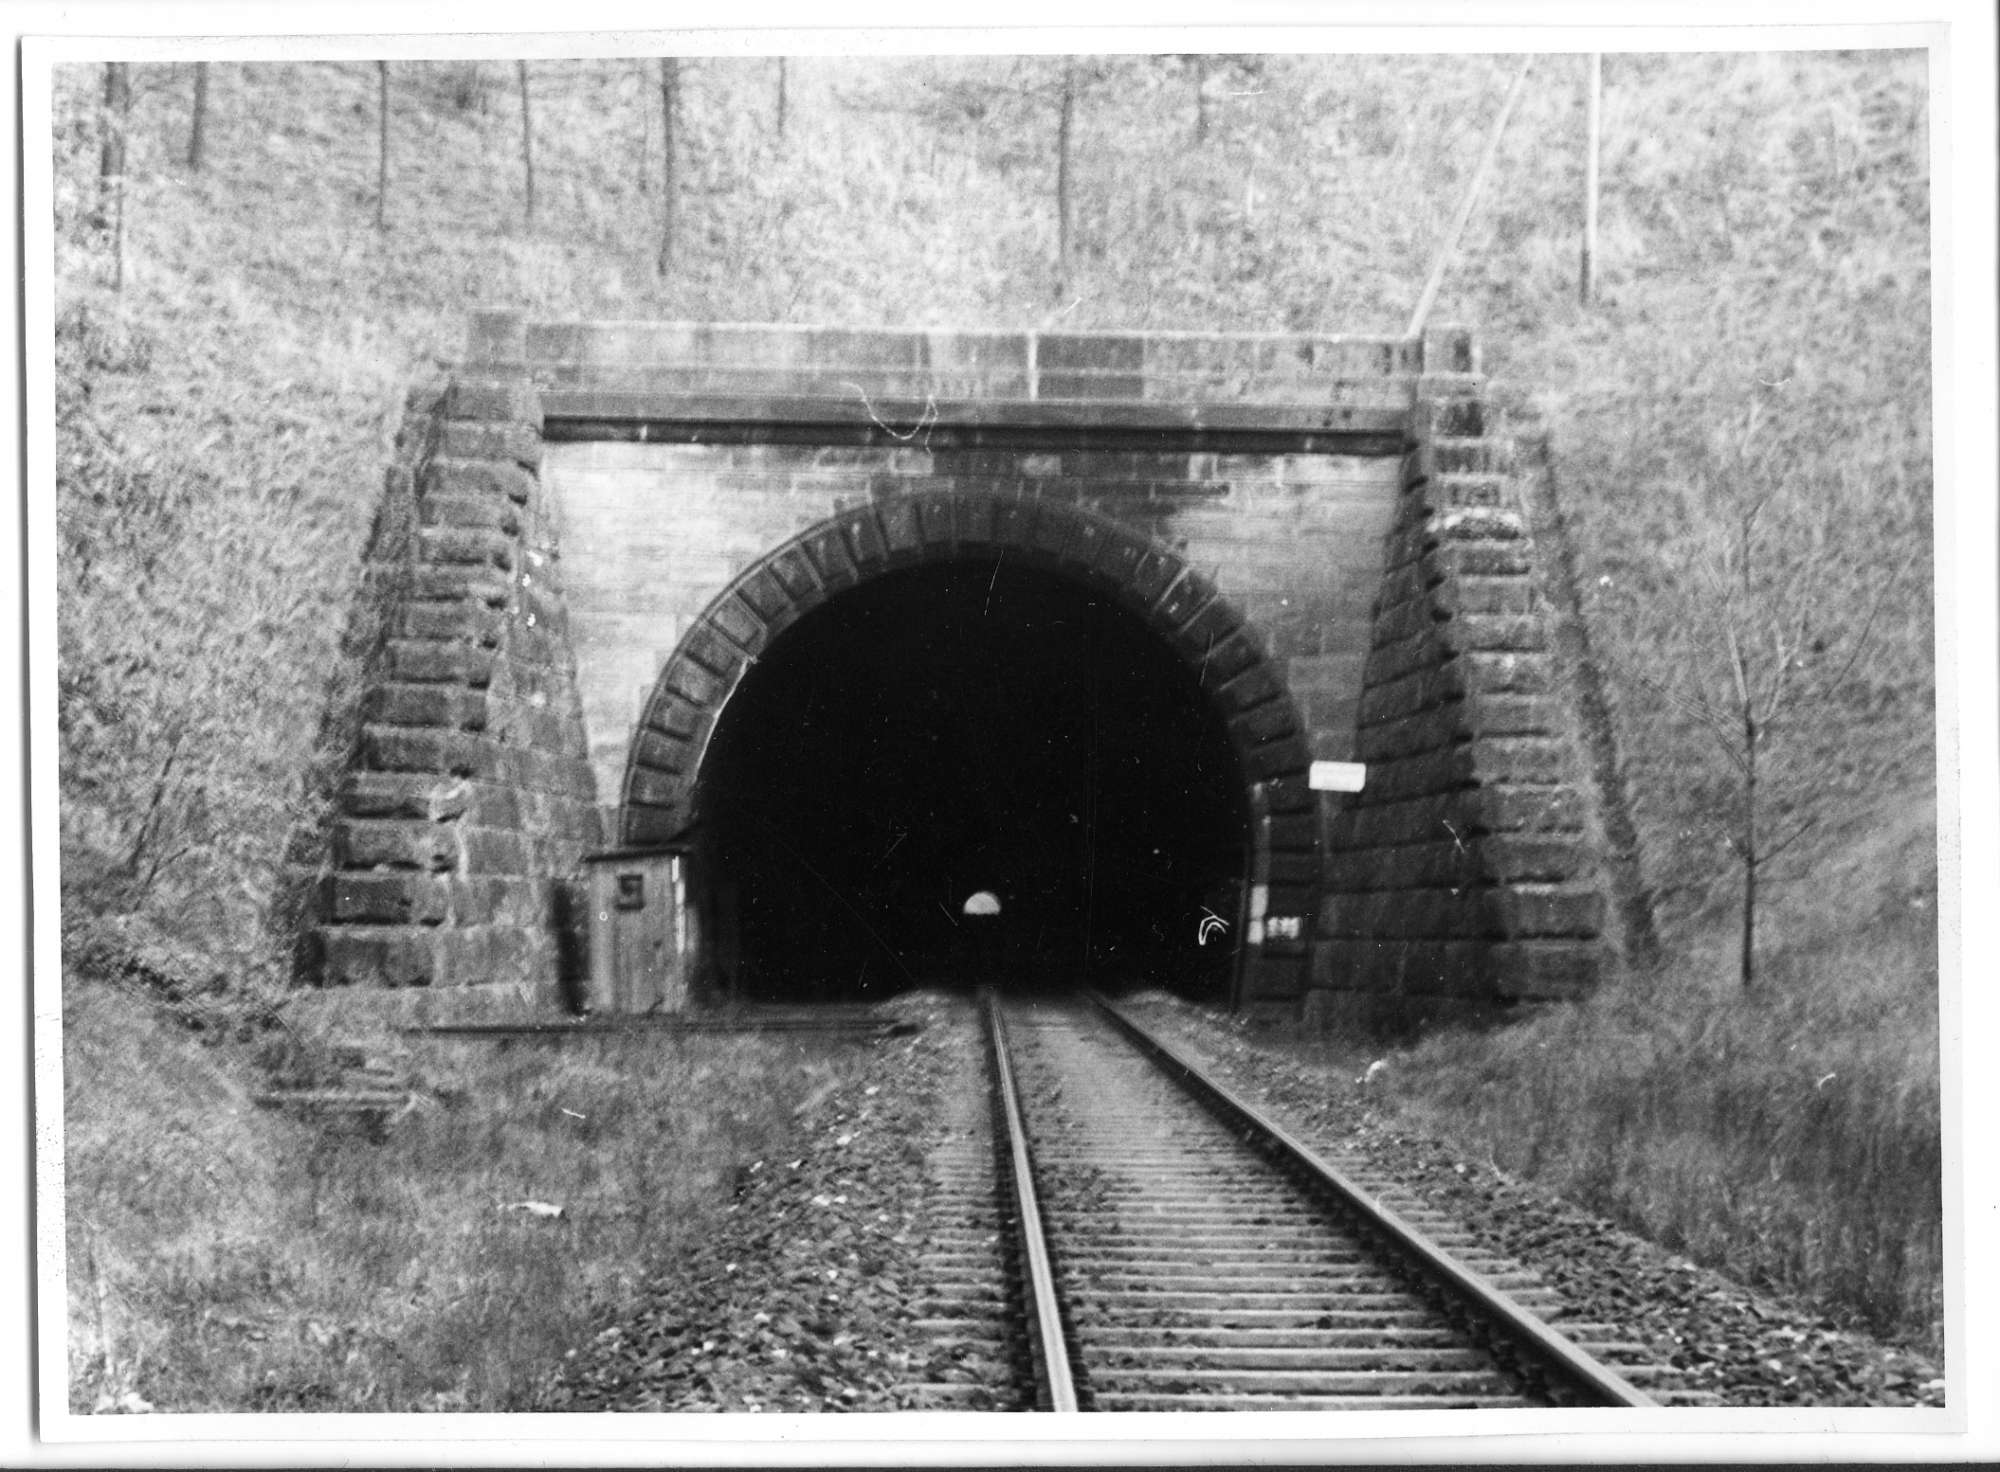 Fichtenberg, Tunnel bei Fichtenberg, Abb. a